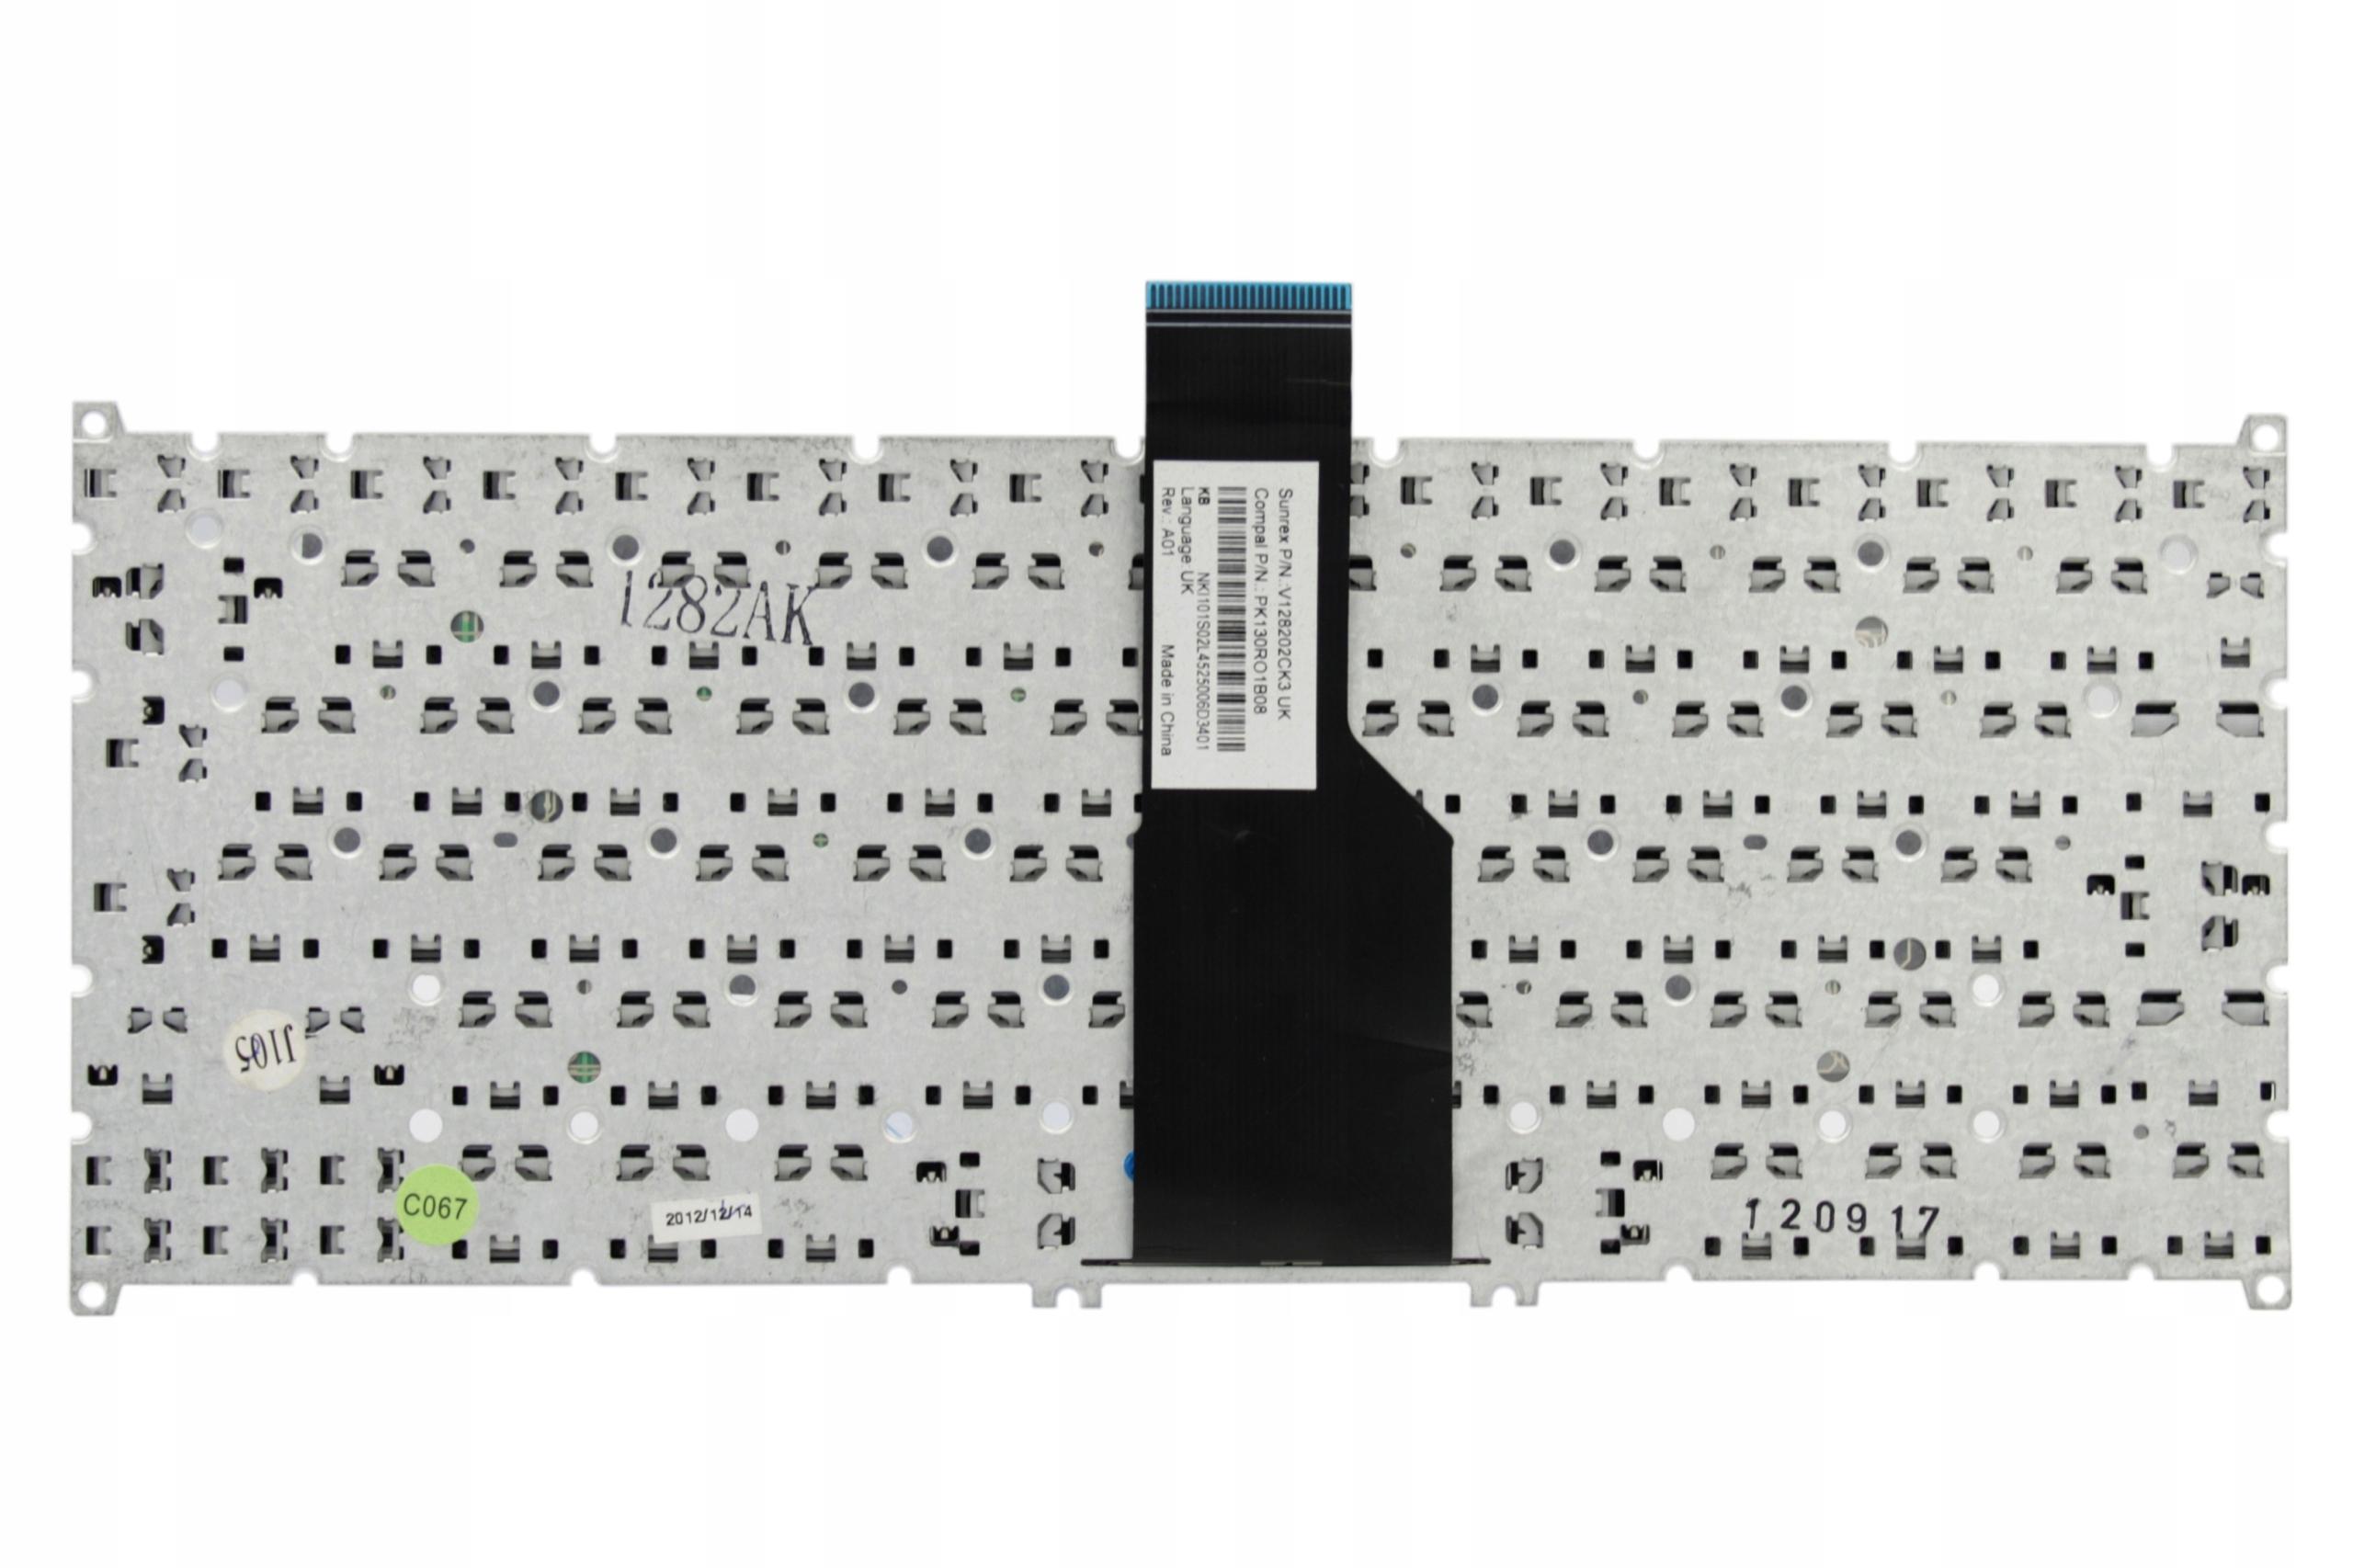 KLAWIATURA ACER ASPIRE V5-121 V5-123 V5-131 V5-171 - Klawiatury do laptopów